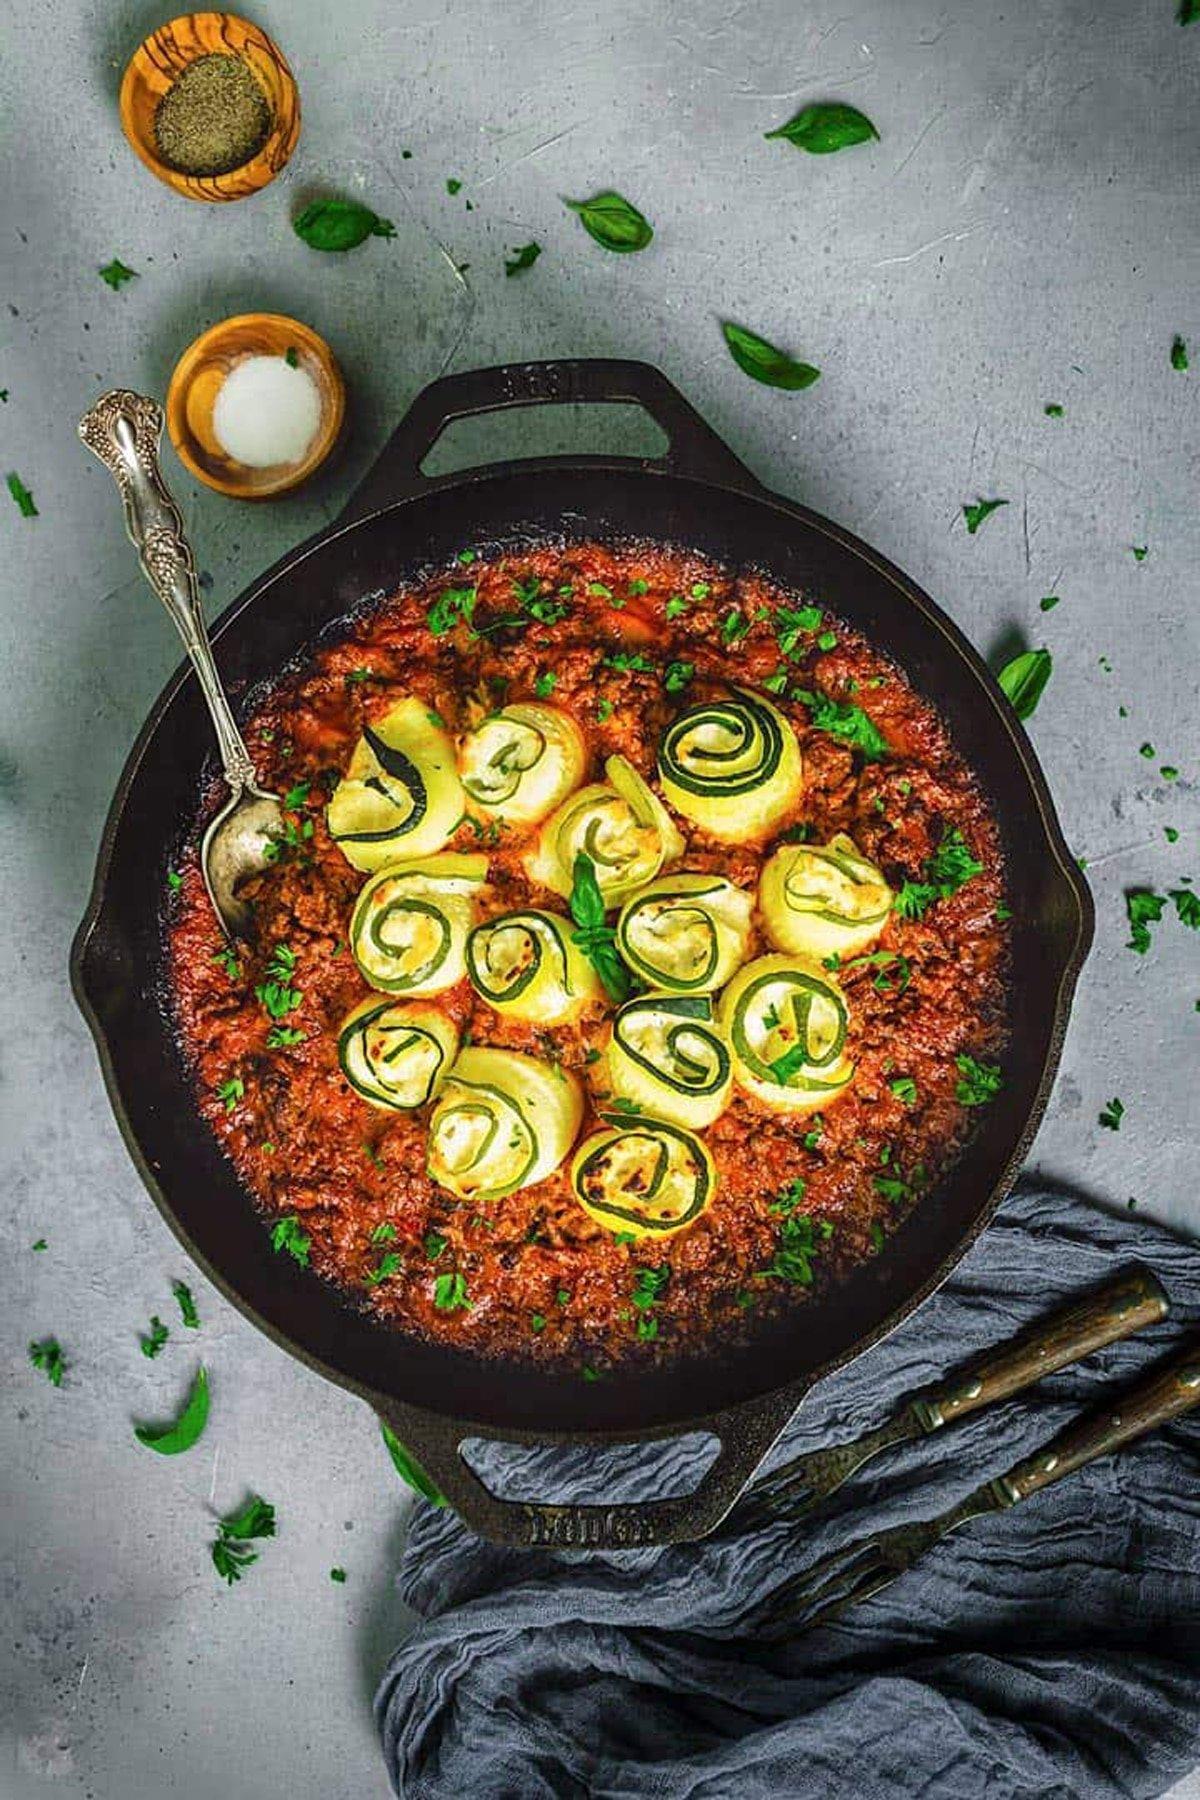 Zucchini rolls in a cast iron skillet of marinara sauce.